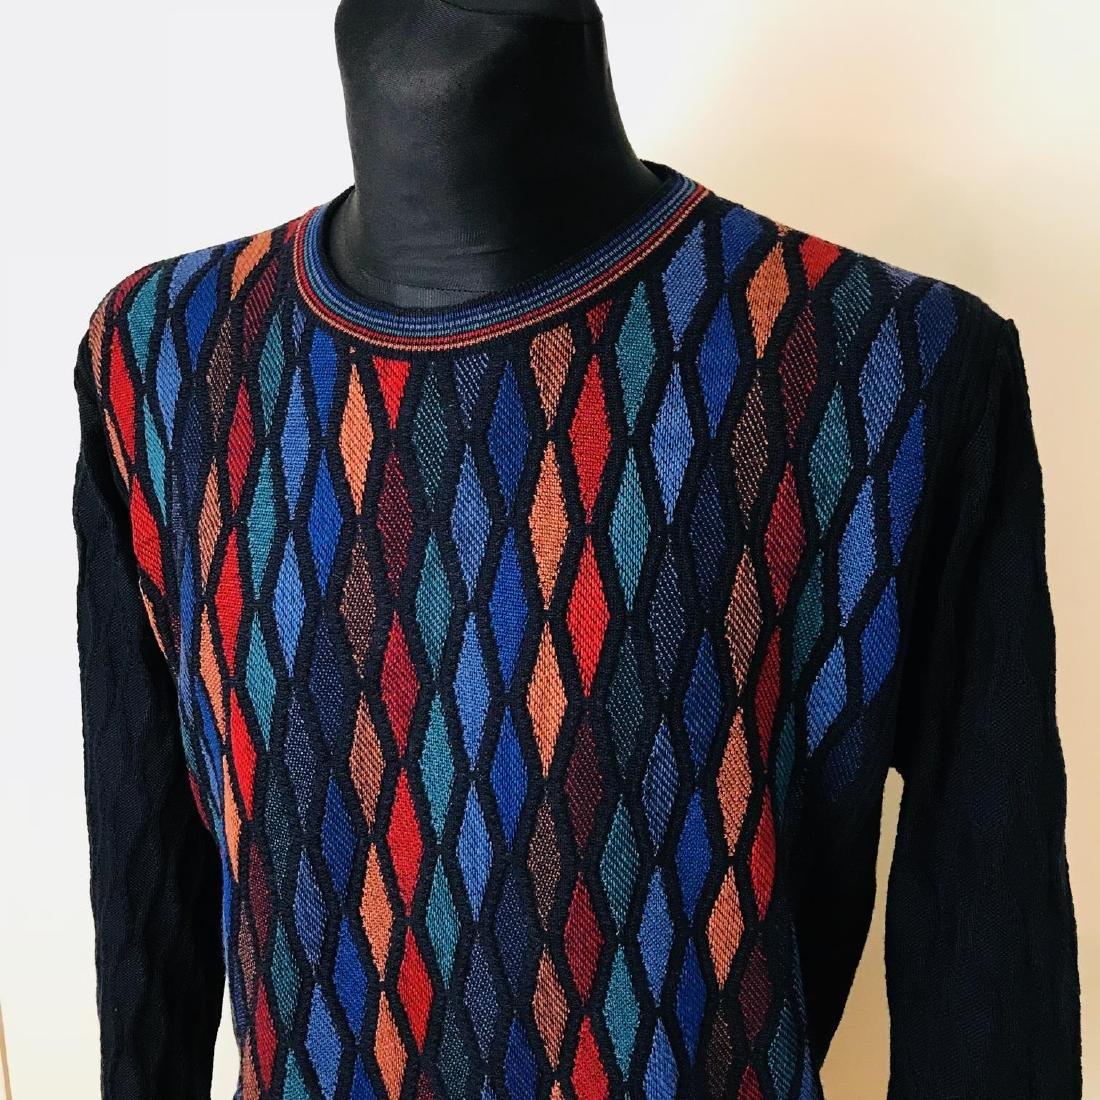 Vintage Men's CARLO COLUCCI Italian Designer Sweater - 2